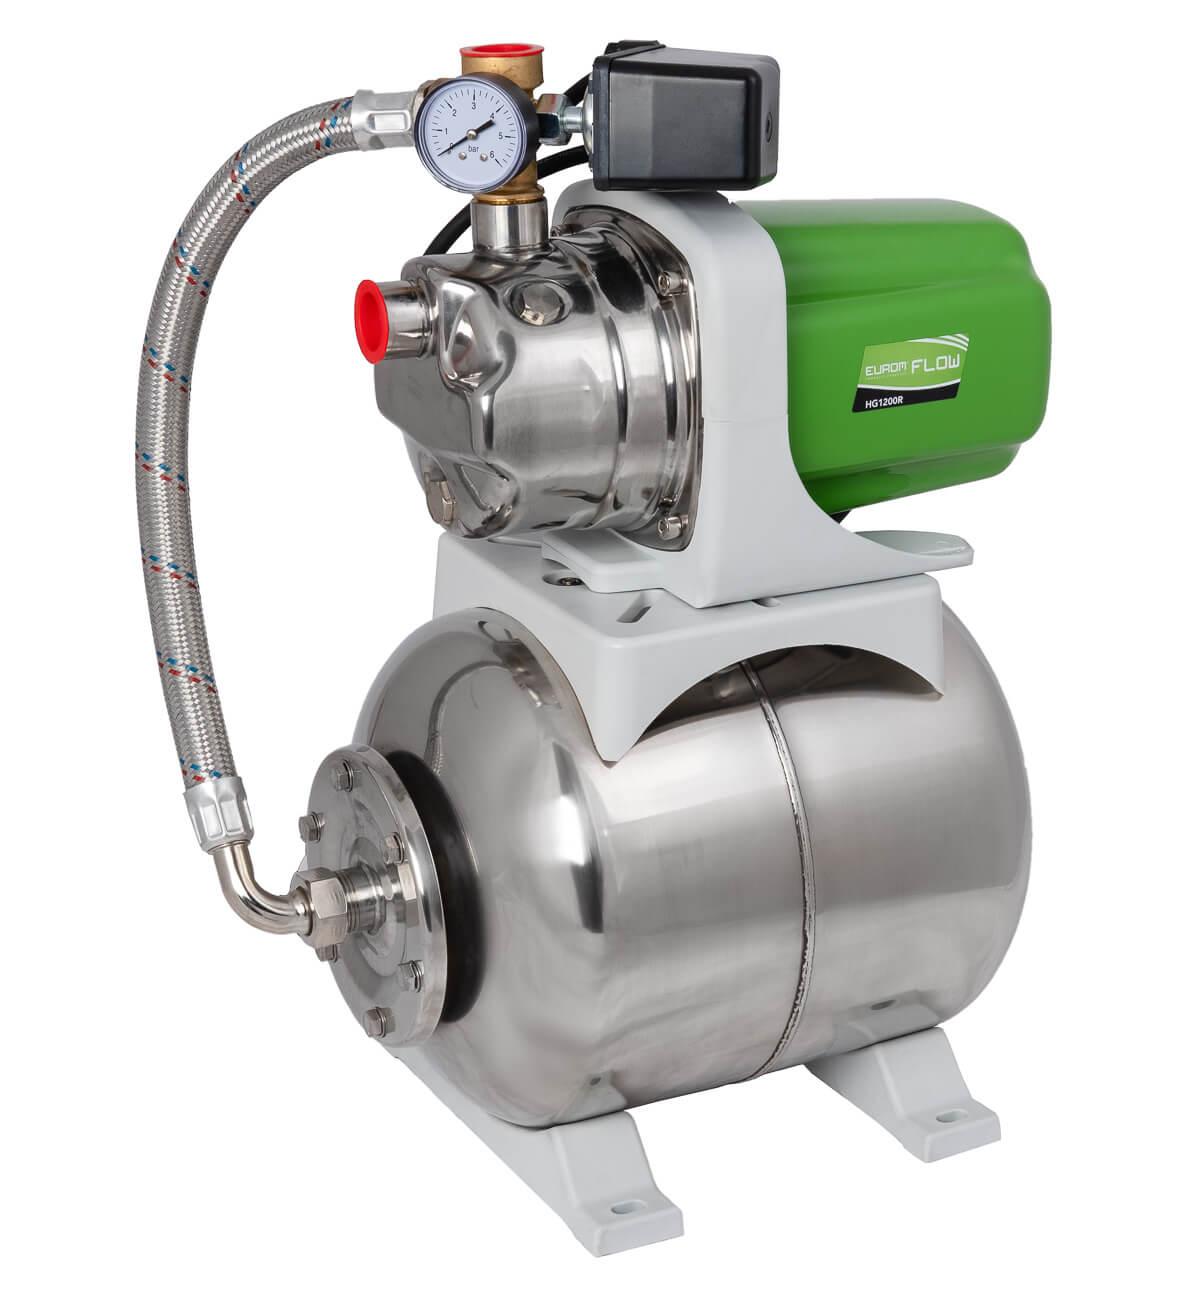 Eurom Flow HG 1200R Drukpomp 1200W | Hydrofoorgroep waterpomp